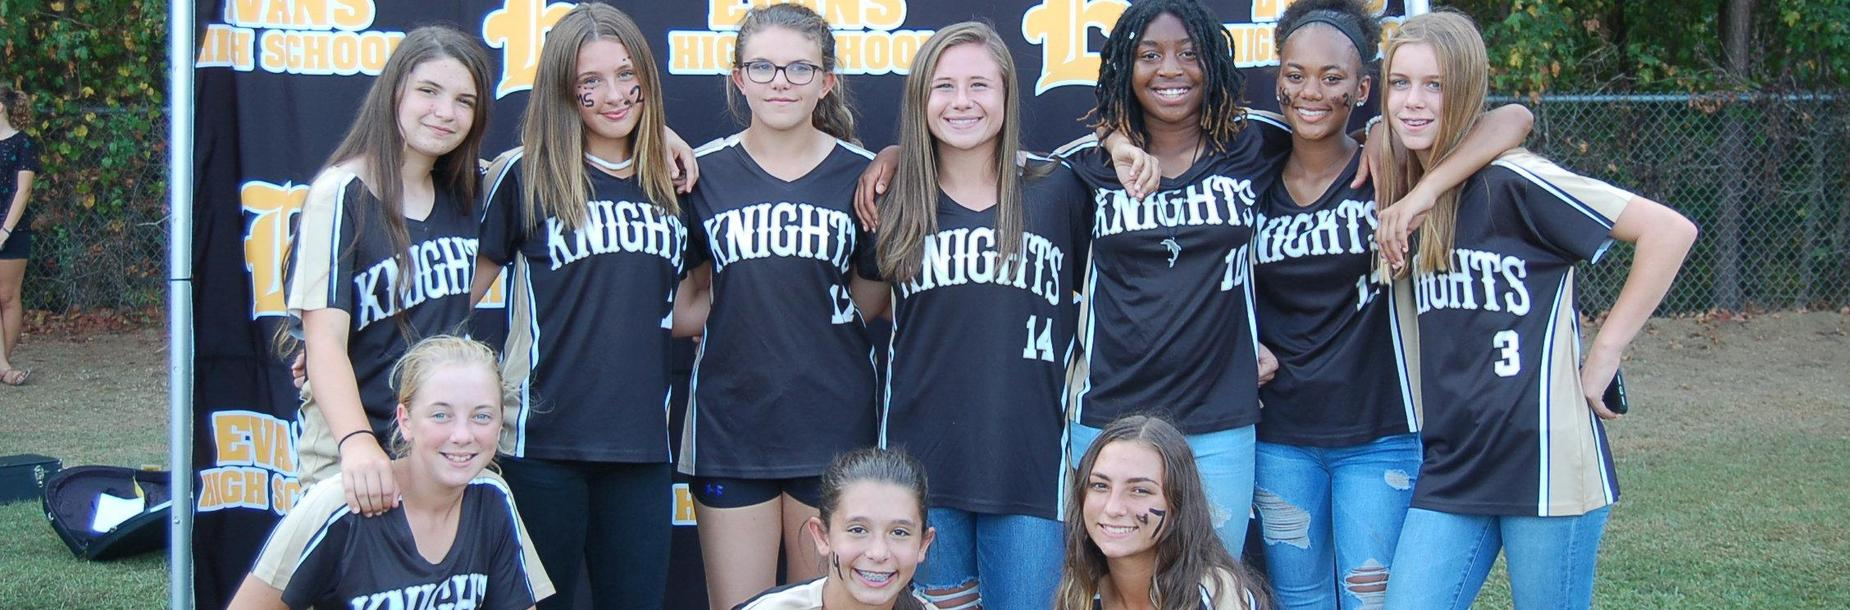 evans middle school girls sports